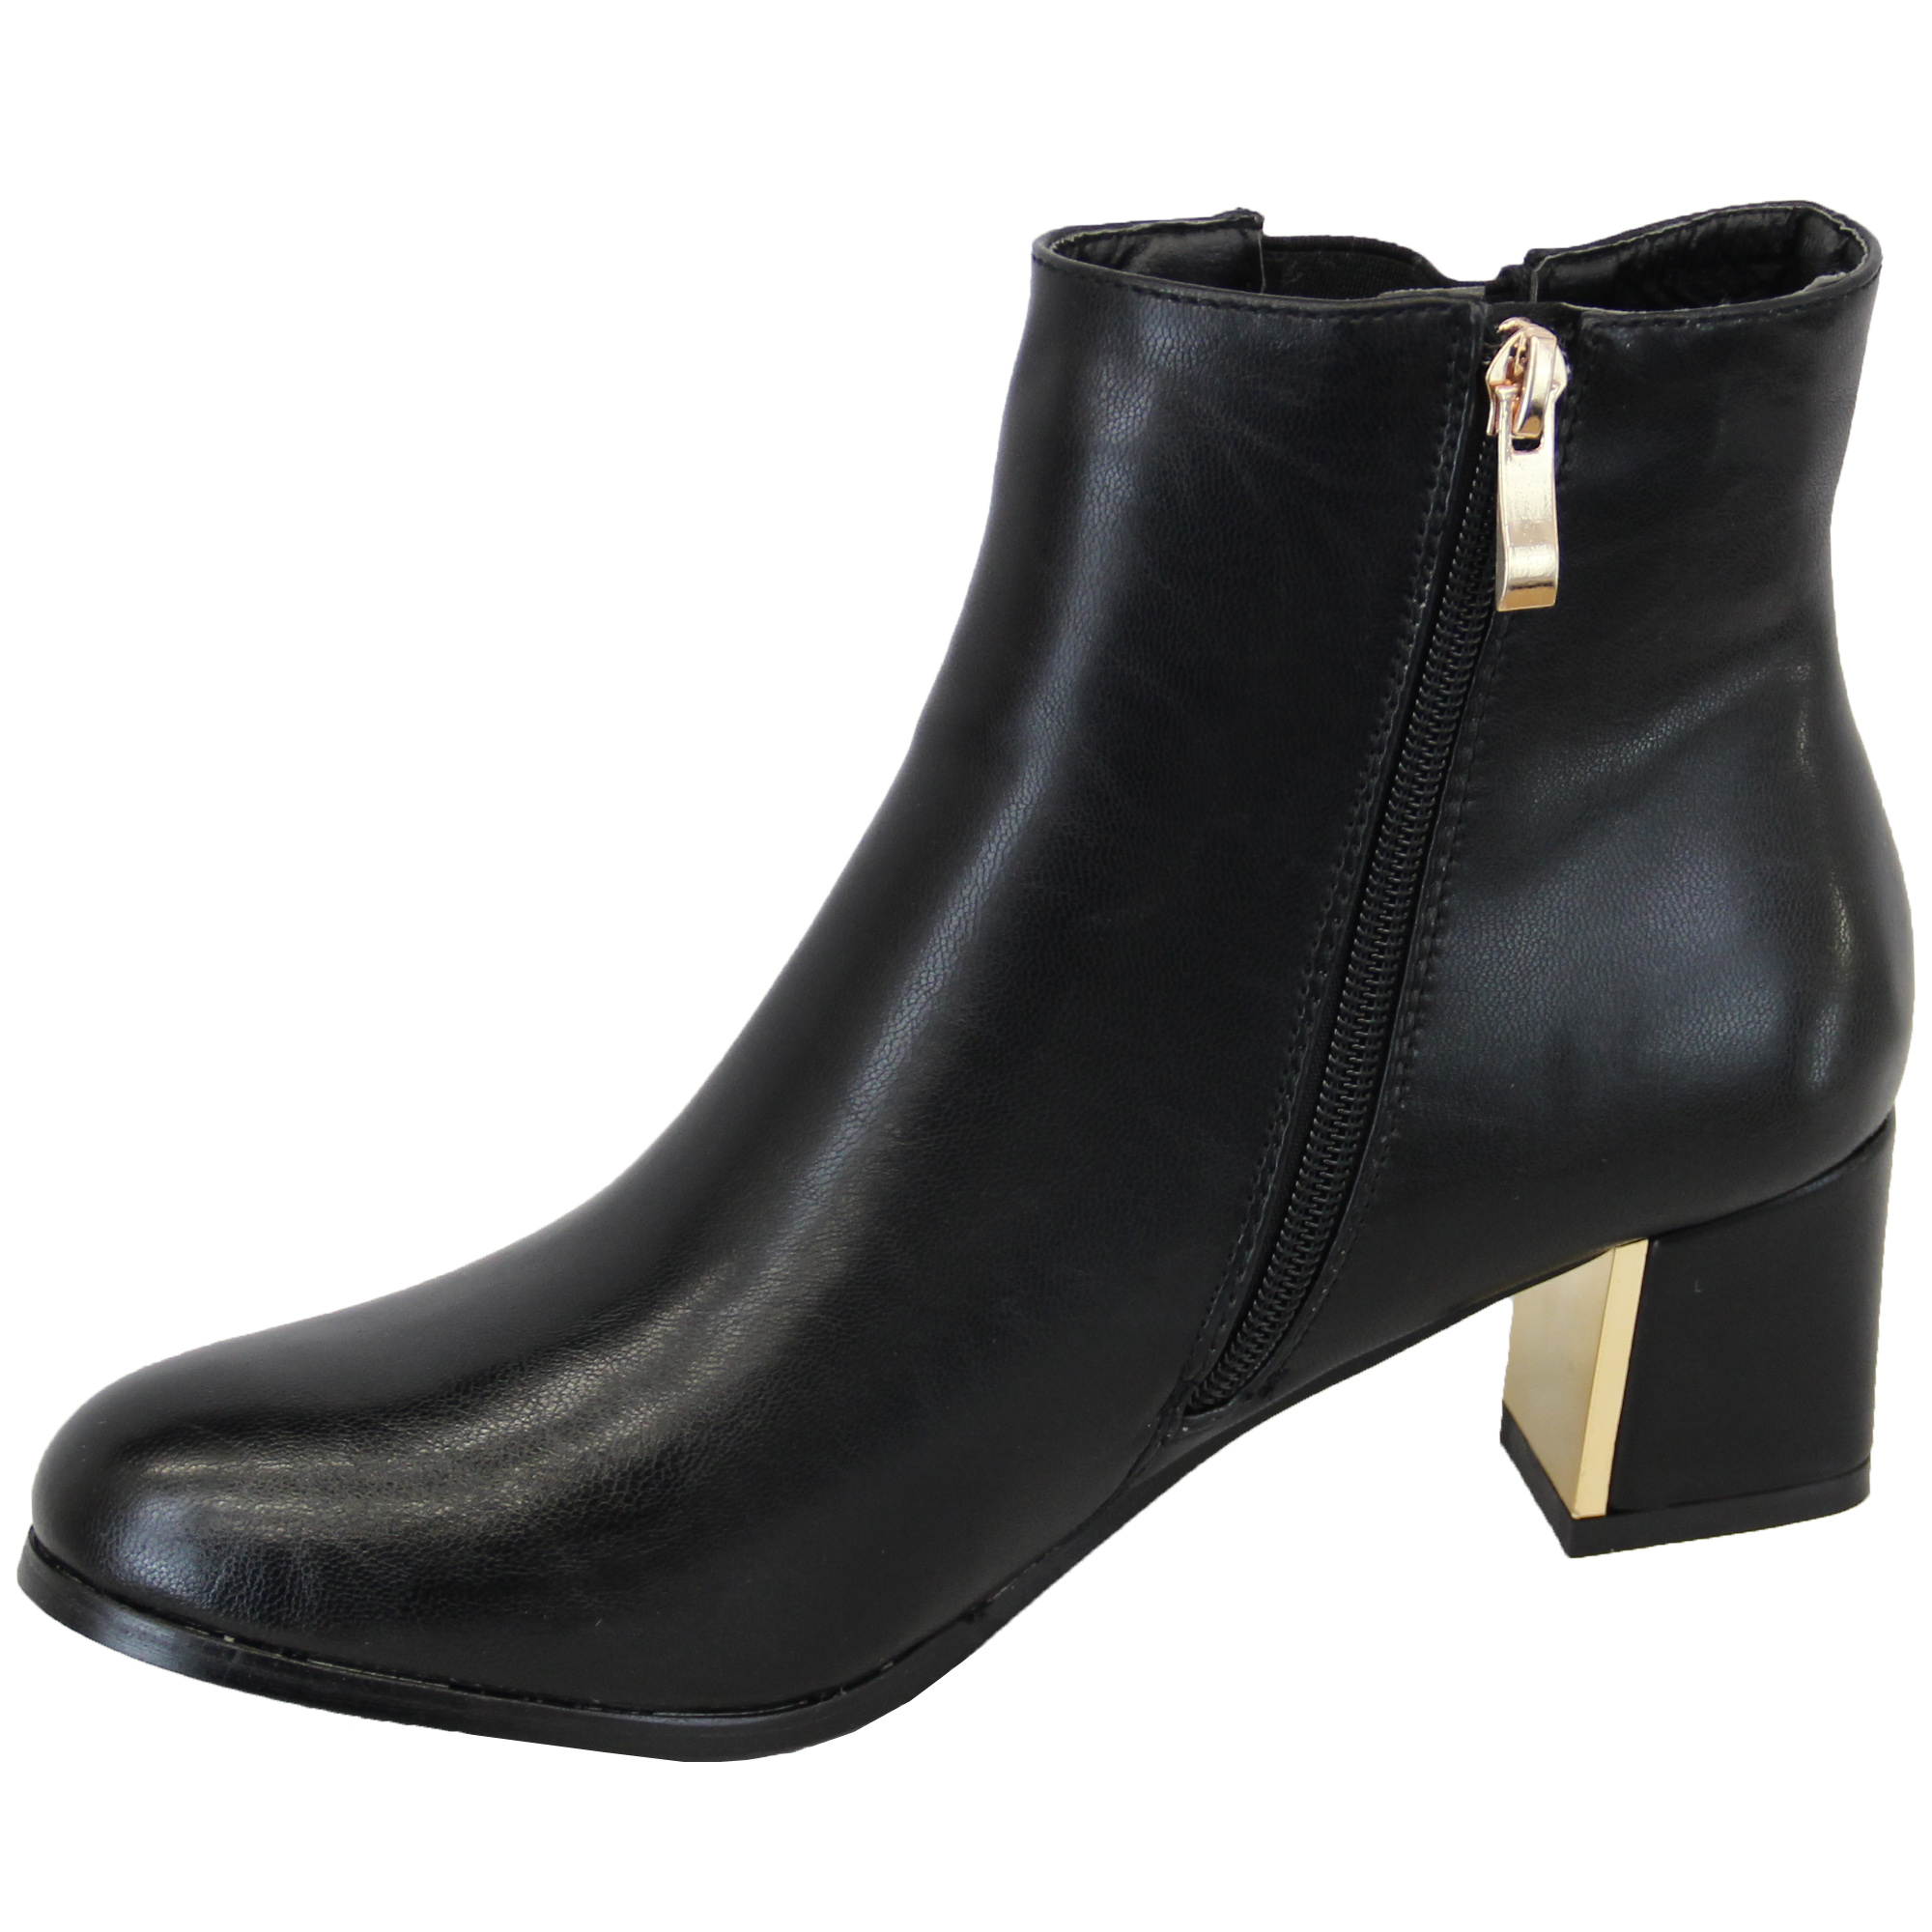 chelsea boots womens kelsi shoes suede look block